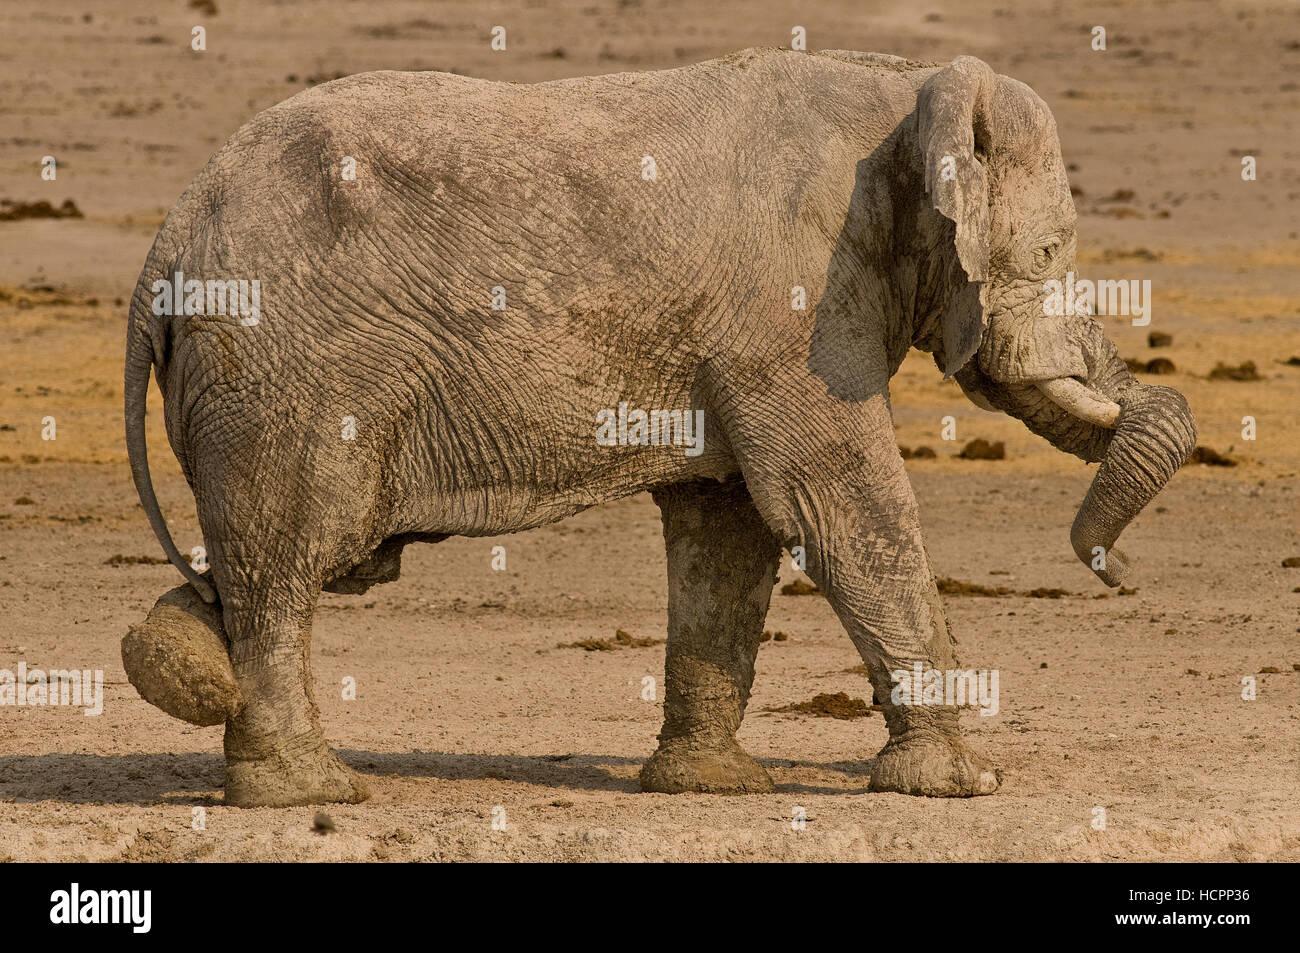 Wüste Elefant (Loxodonta Africana) in einer Yoga-pose Stockbild